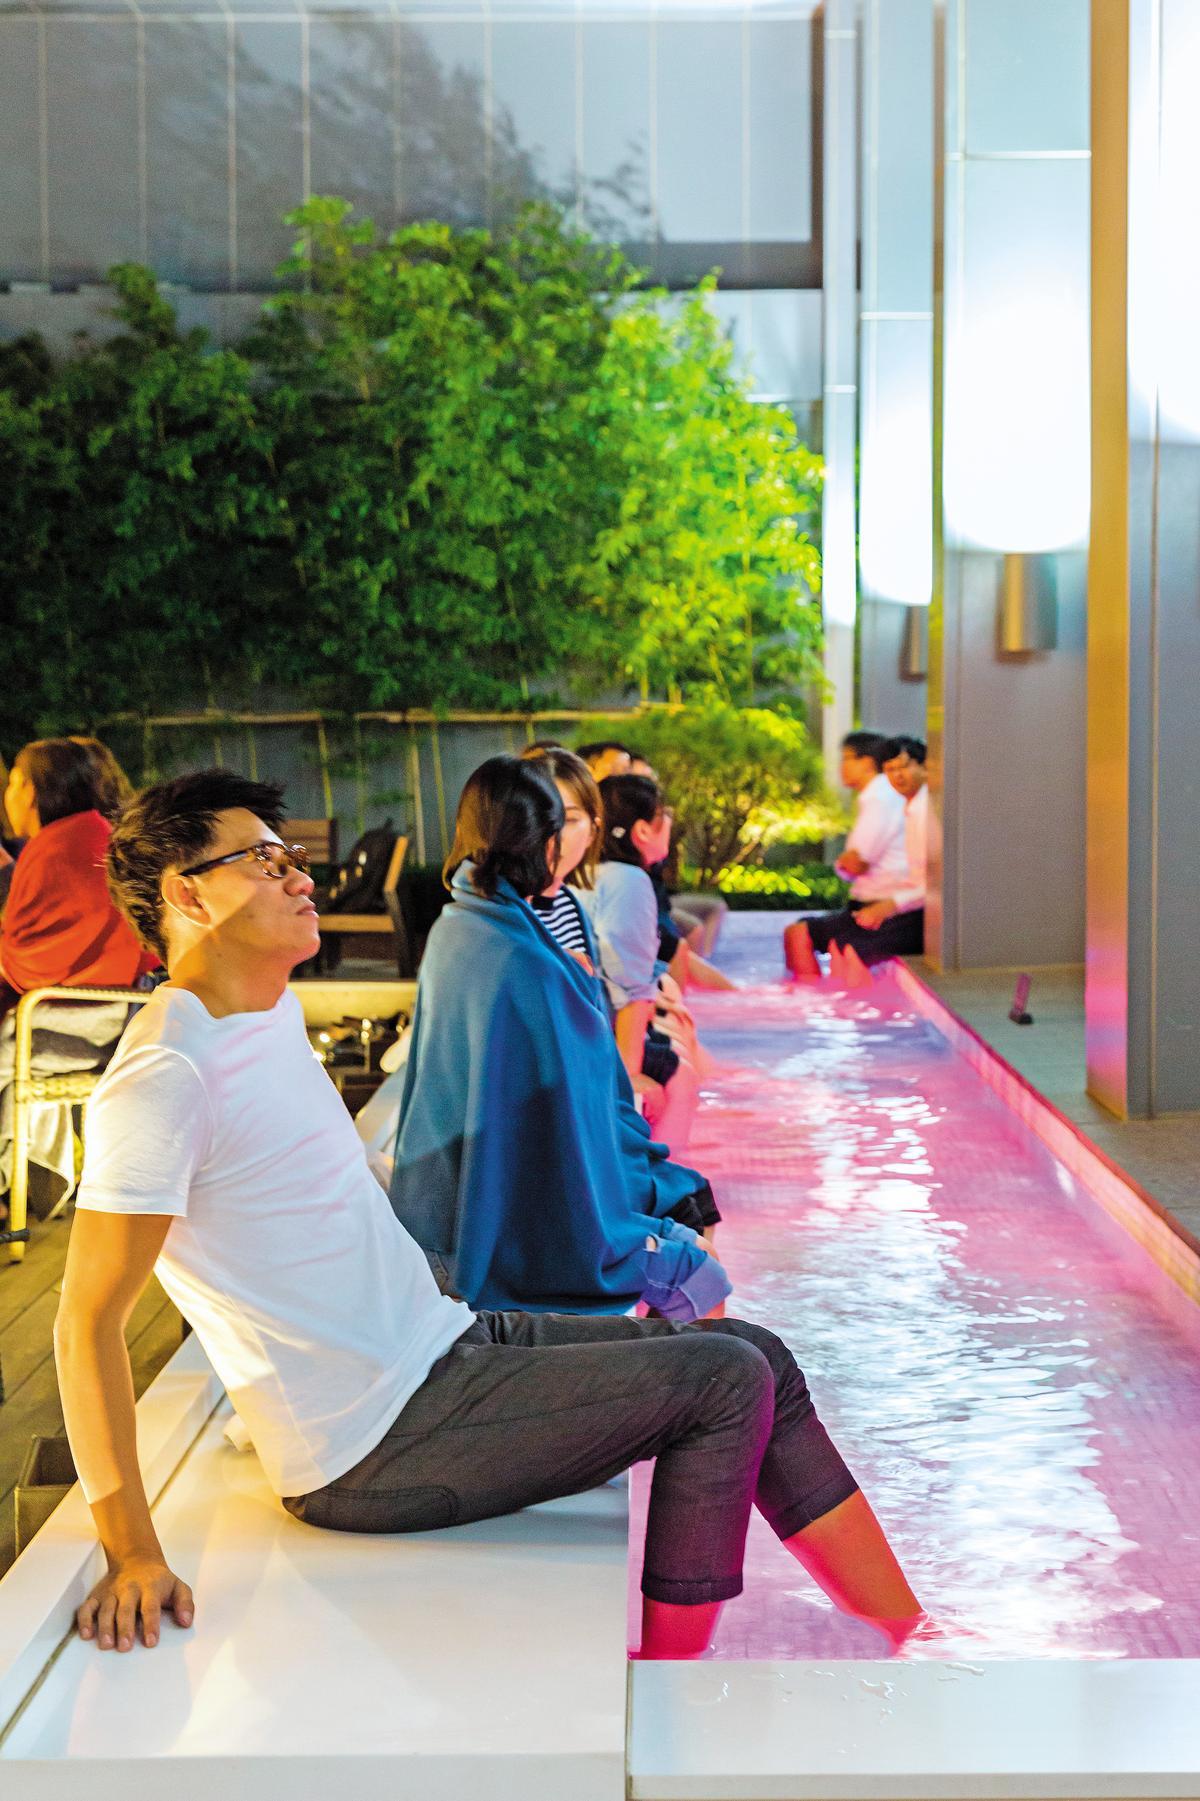 「Long Day Foot Spa」的足浴,旅人可將雙腳放入溫水,緩解疲勞。